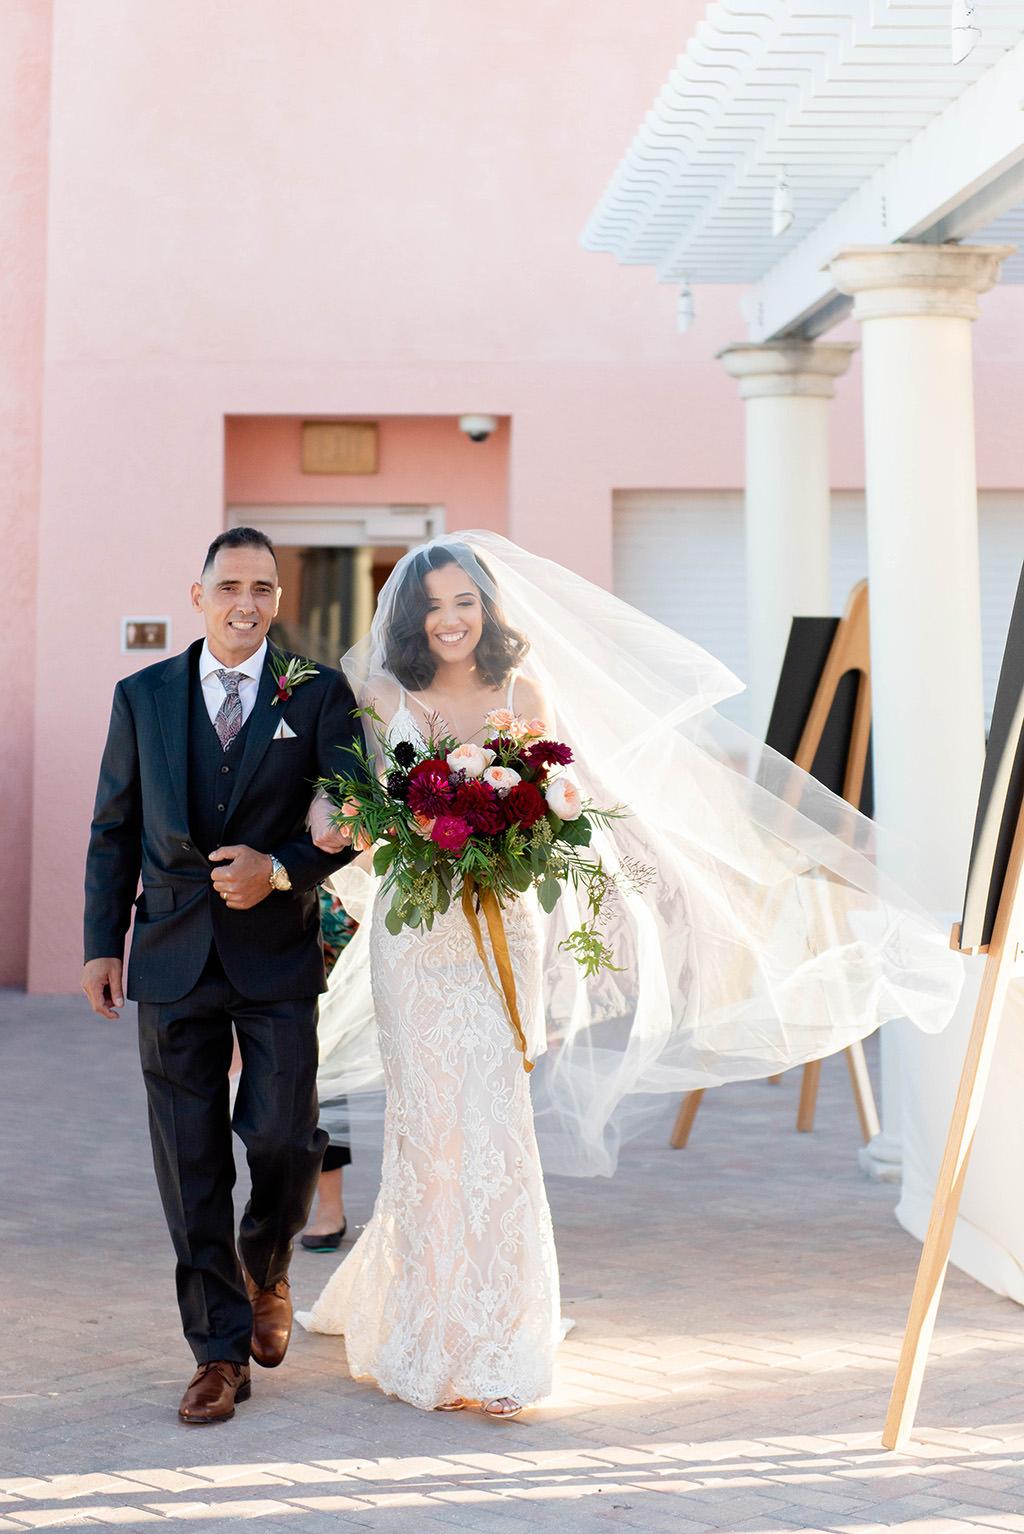 Florida Bride with Father Walking Down the Wedding Ceremony Aisle Processional with Veil Wedding Portrait | Tampa Bay Wedding Dress Shop Isabel O'Neil Bridal Collection | Galia Lahav Wedding Dress